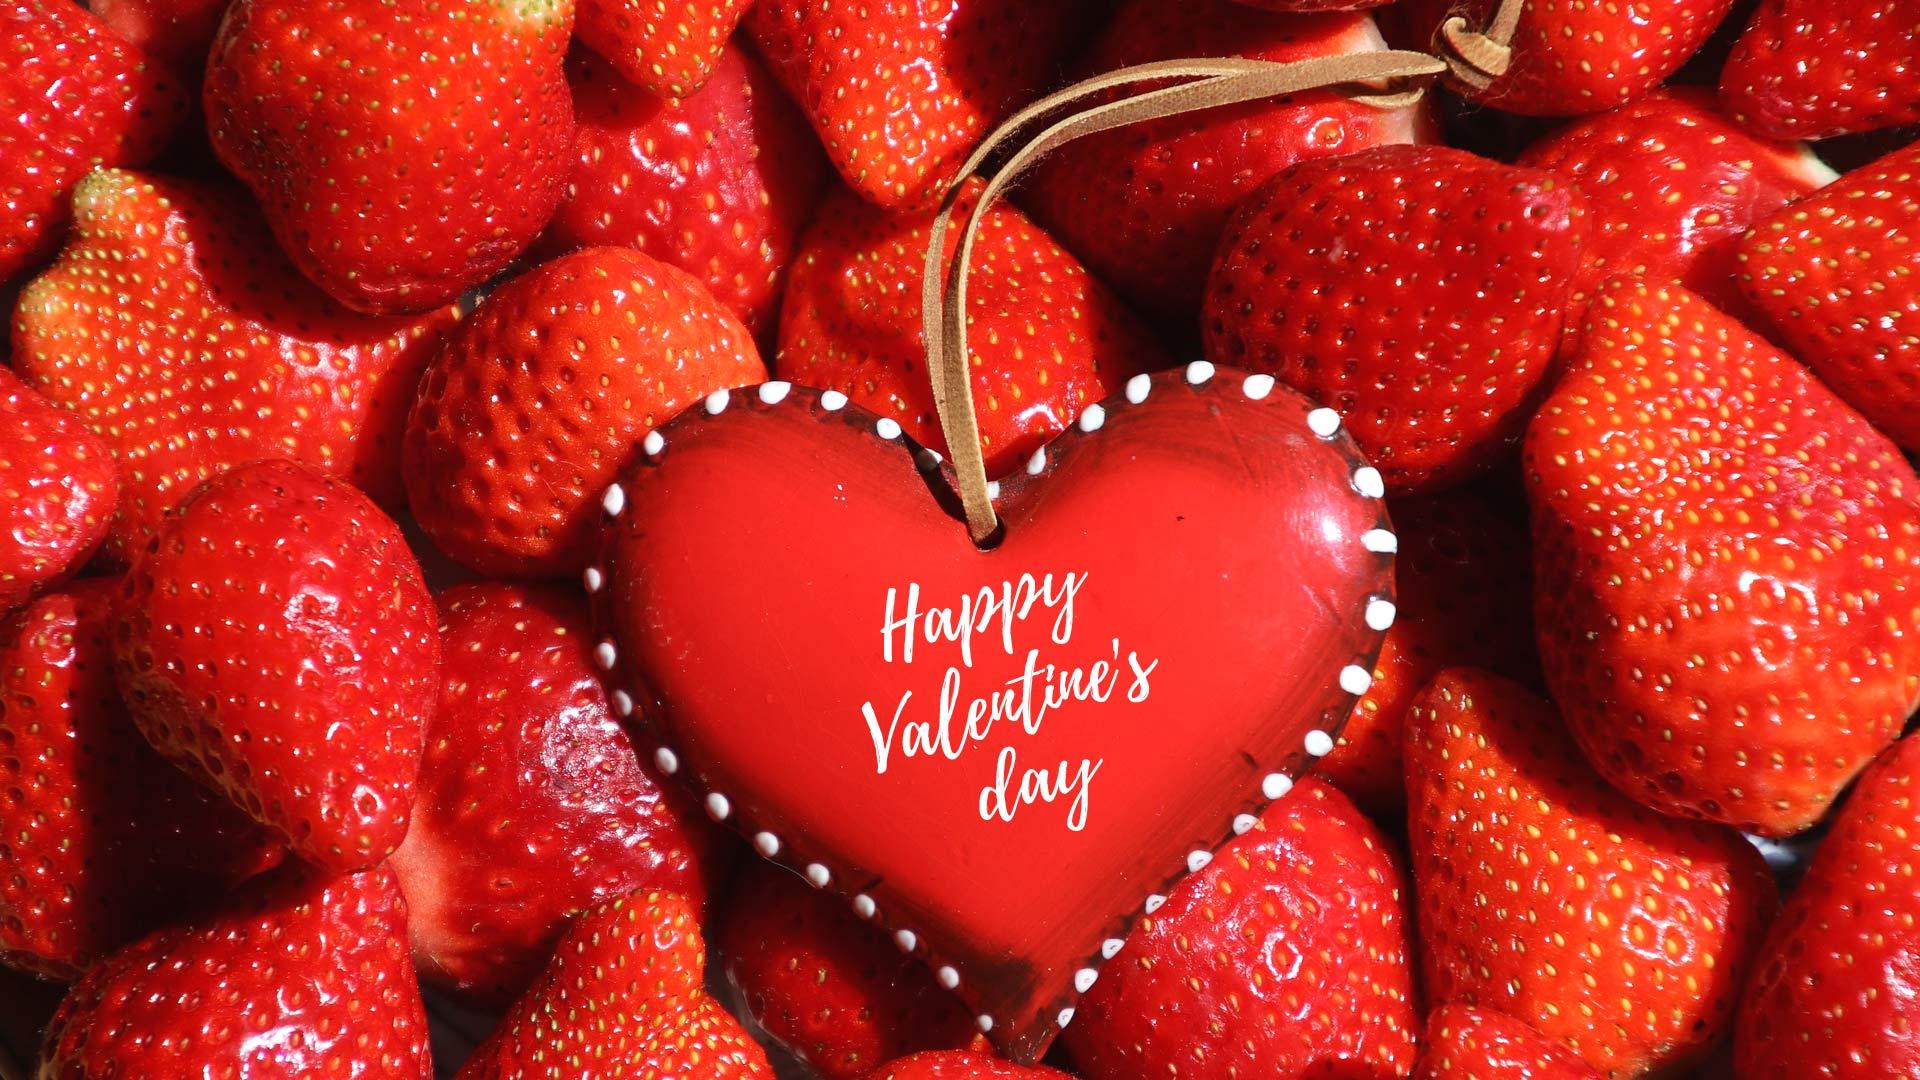 Valentines Day wallpaper desktop background 2021 hd download 1920x1080